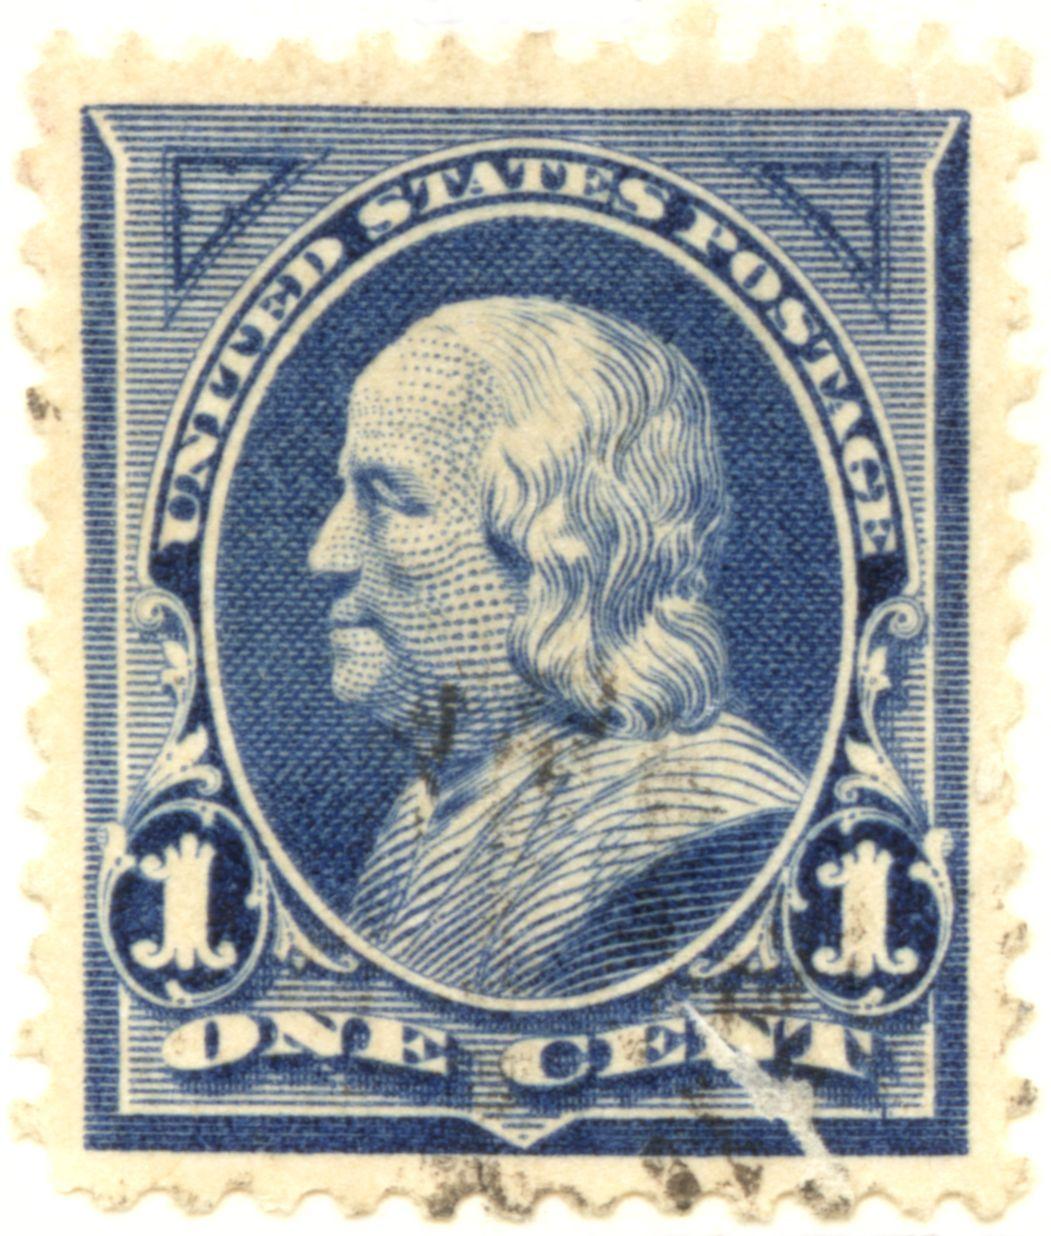 Pin Lisa Pratt Postage Stamps Stamp